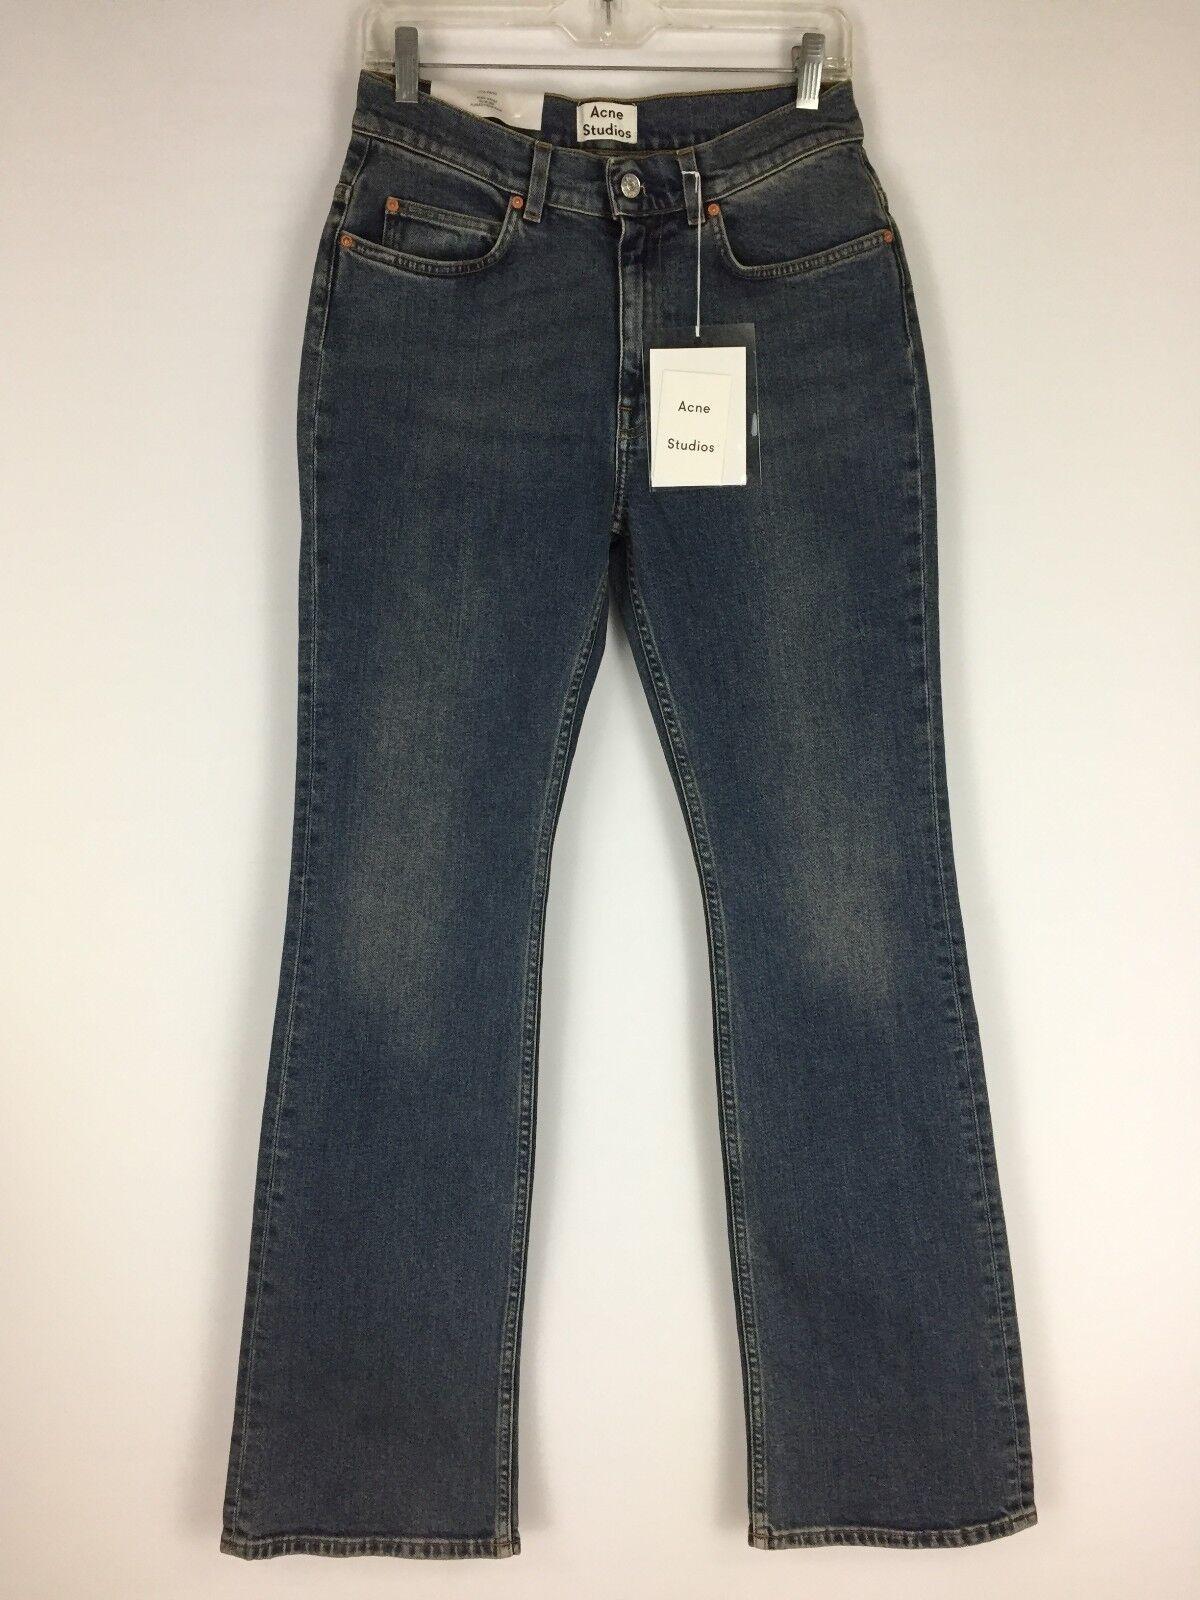 NWT Acne Studios Womens Sz 29 32 Medium Wash Lita Vintage High Waist Jeans